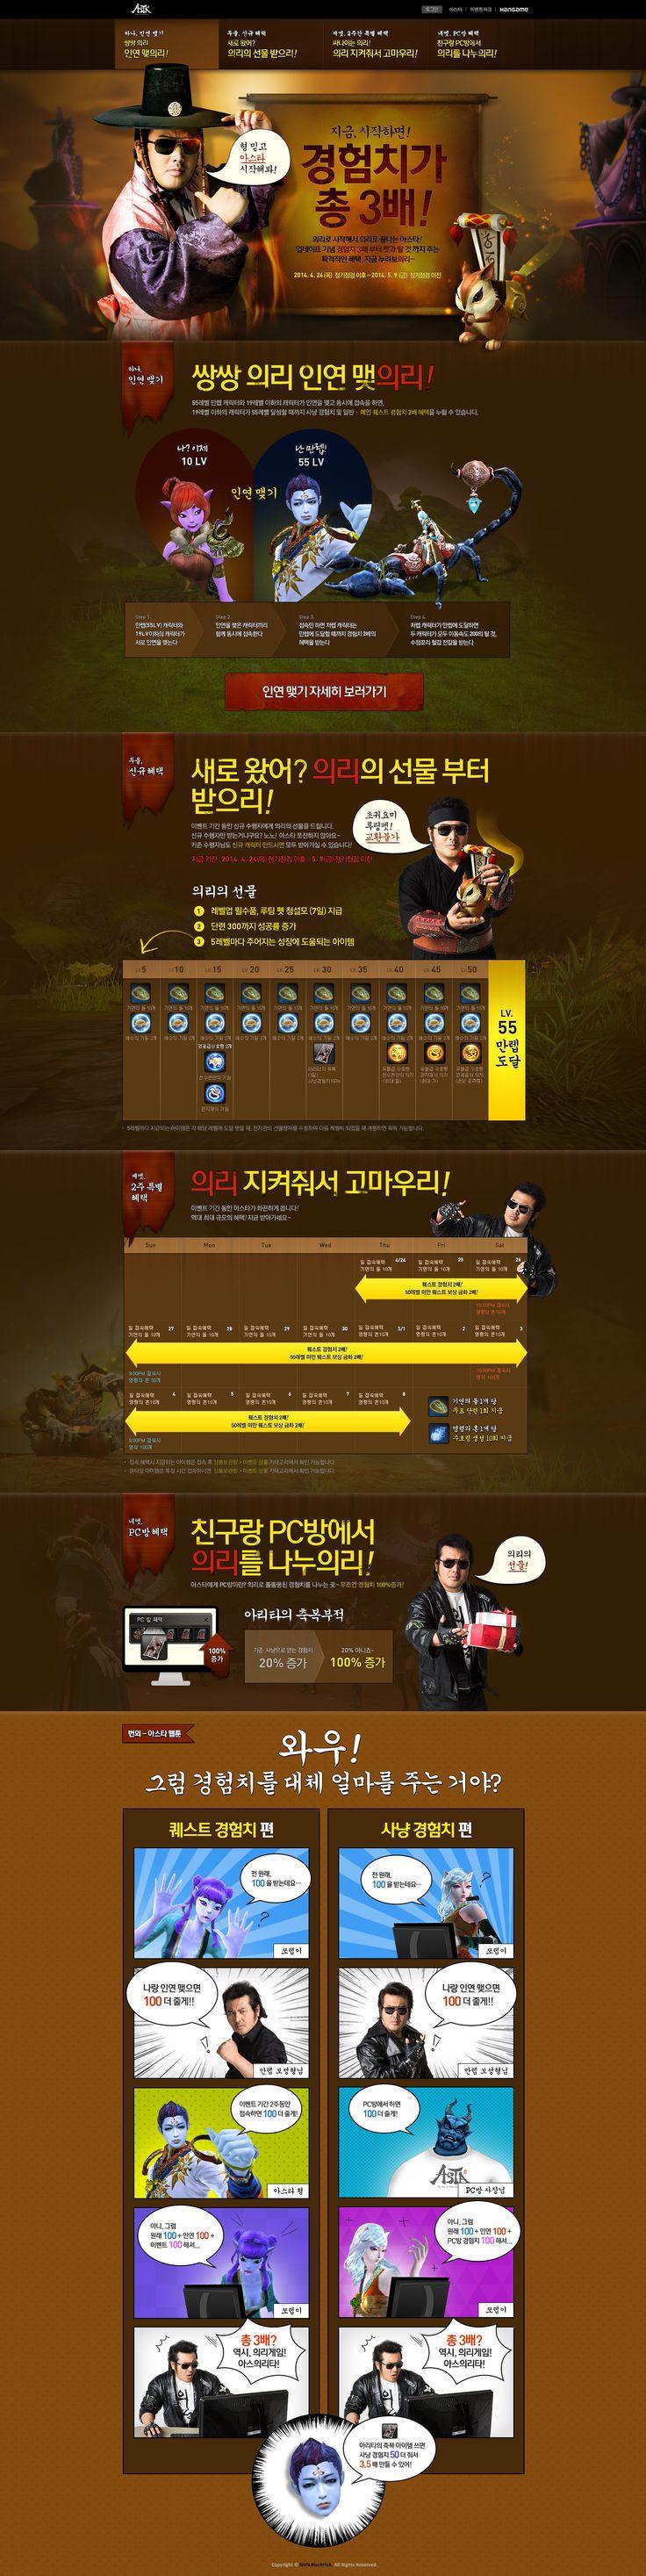 #game #web #design #korea